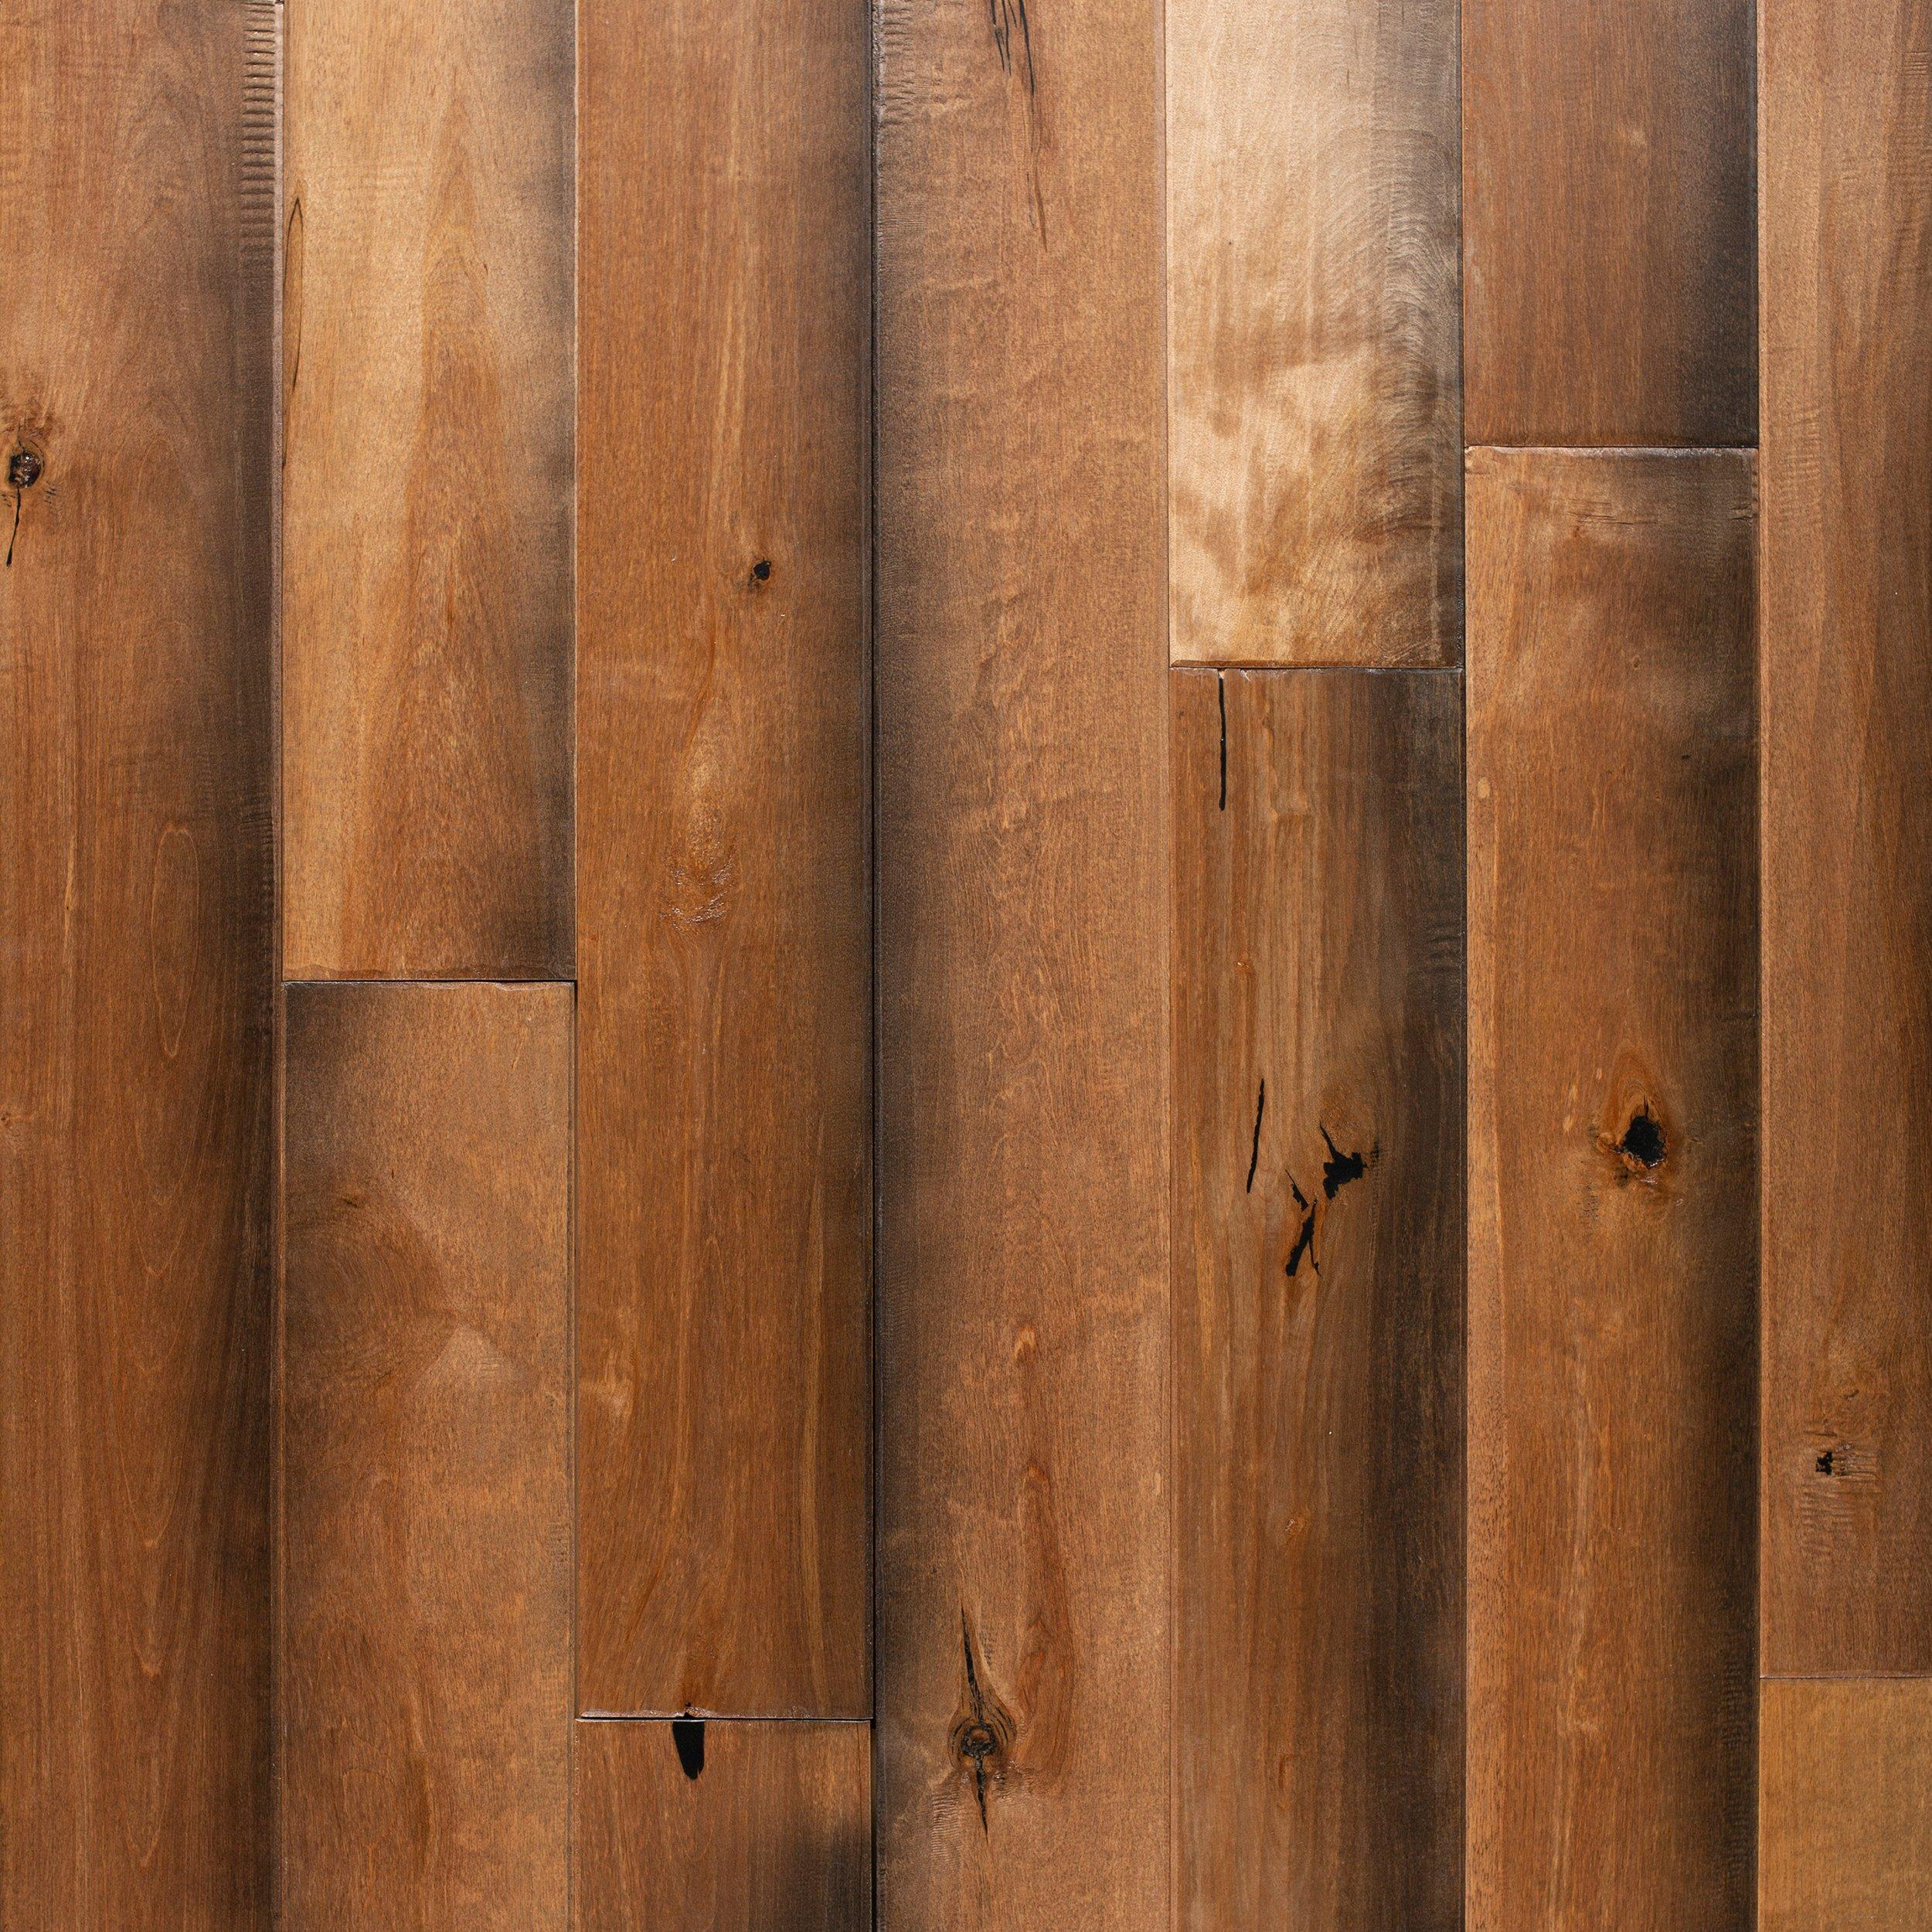 tawny birch hand scraped solid hardwood 34in x 4 34in floor and decor - Hand Scraped Hardwood